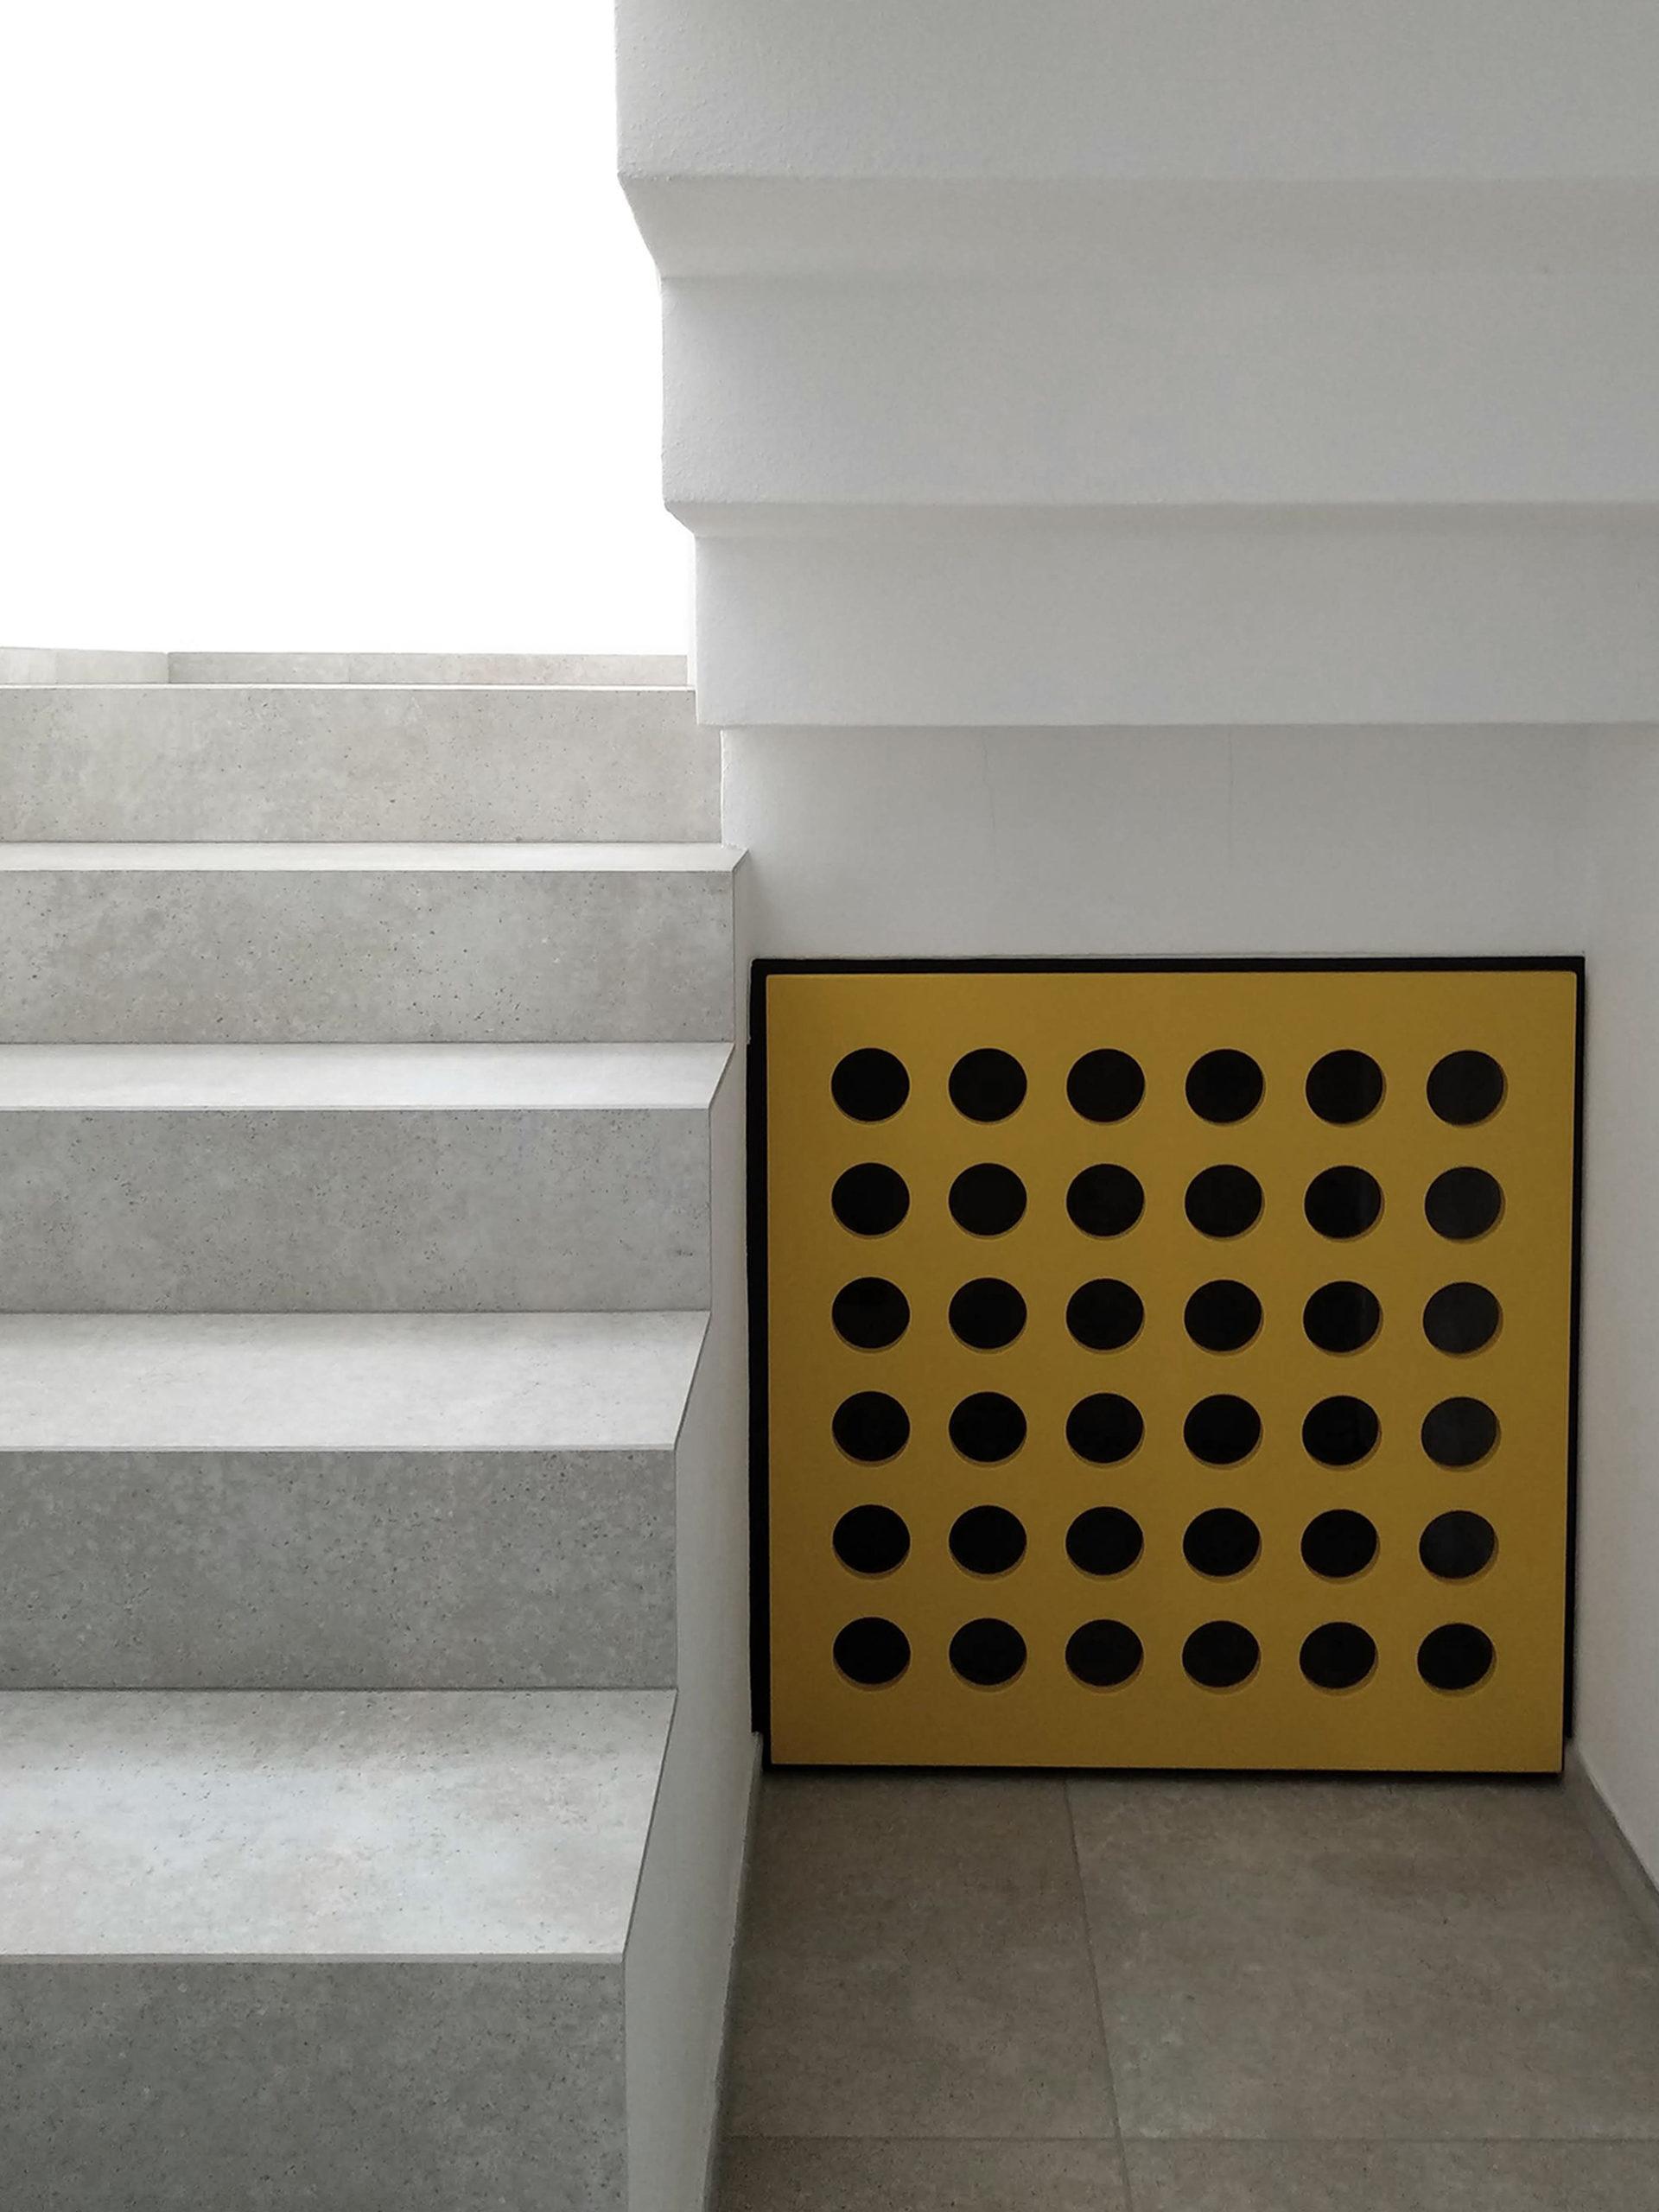 umberto_mauri_architetto_mauri_studio_lago_pusiano_como_bosisio_parini_private_renovation_house_residential_2000_010